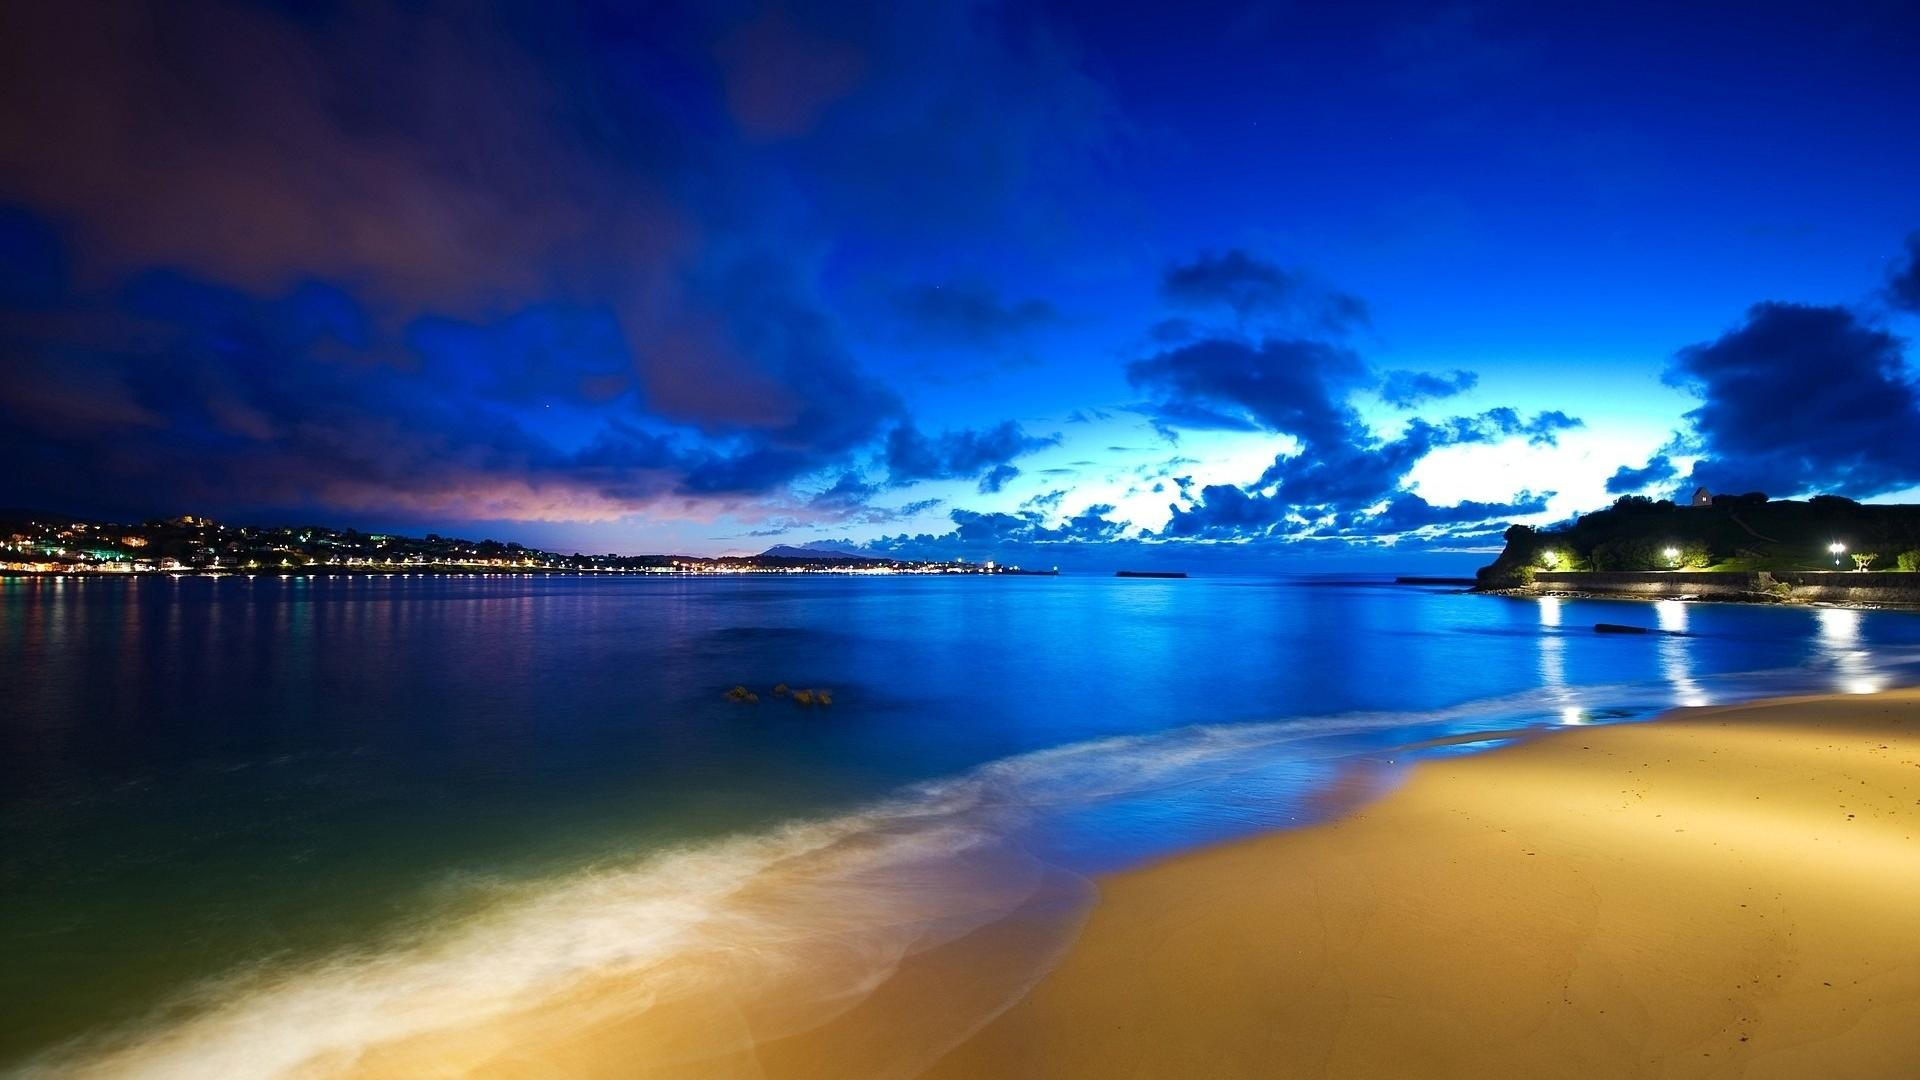 The blue sky coast scenic desktop backgrounds wide wallpapers :1280×800,1440×900,1680×1050